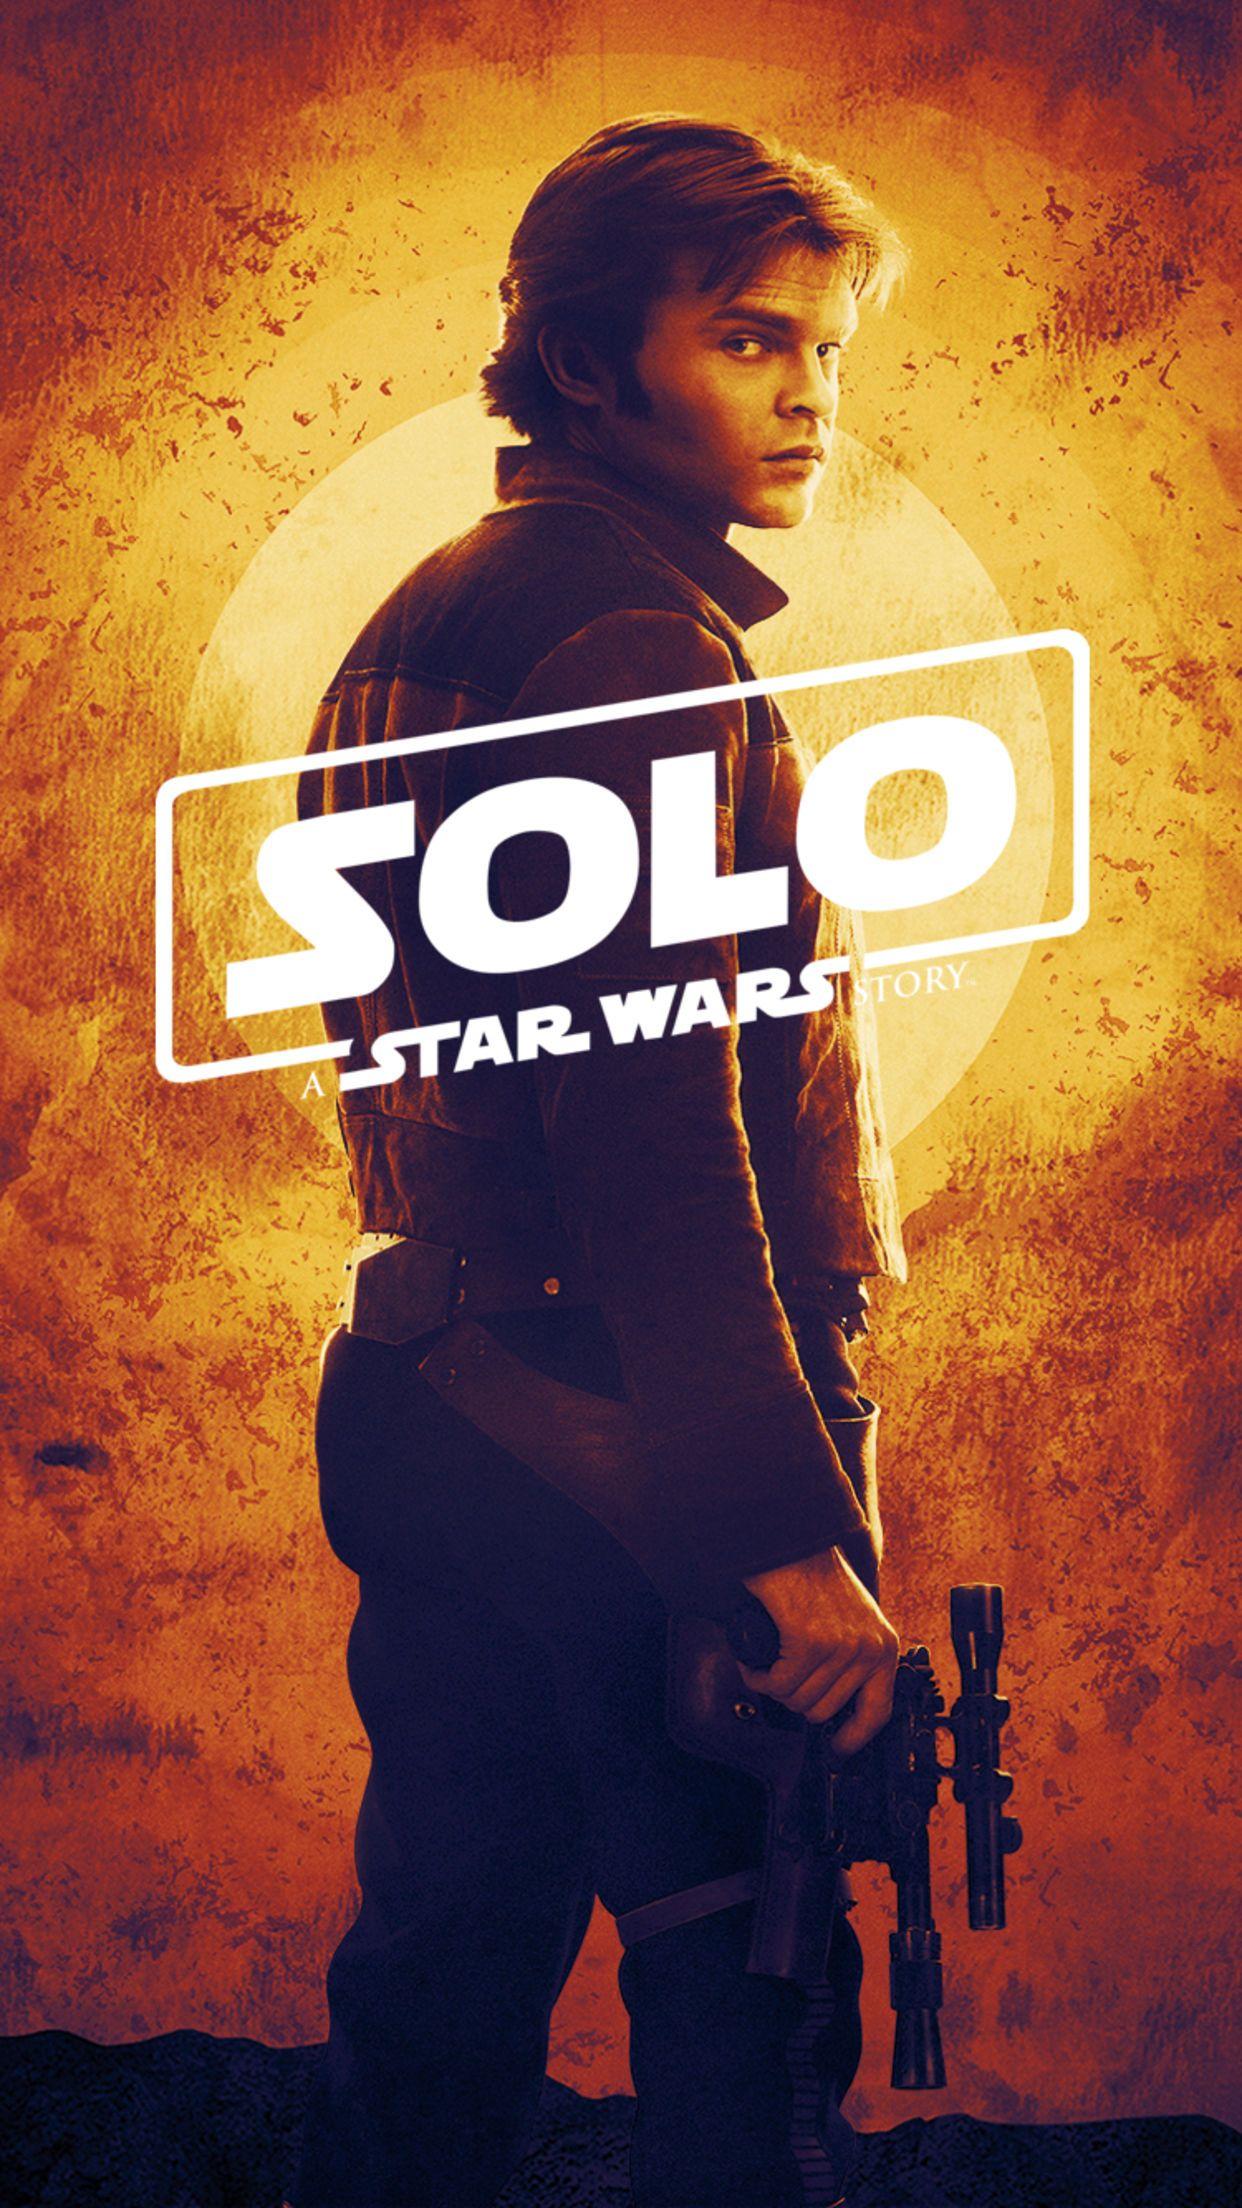 Solo New Poster Https Teaser Trailer Com Movie Star Wars Han Solo Starwars Hansolo Solo Aldenehrenreich